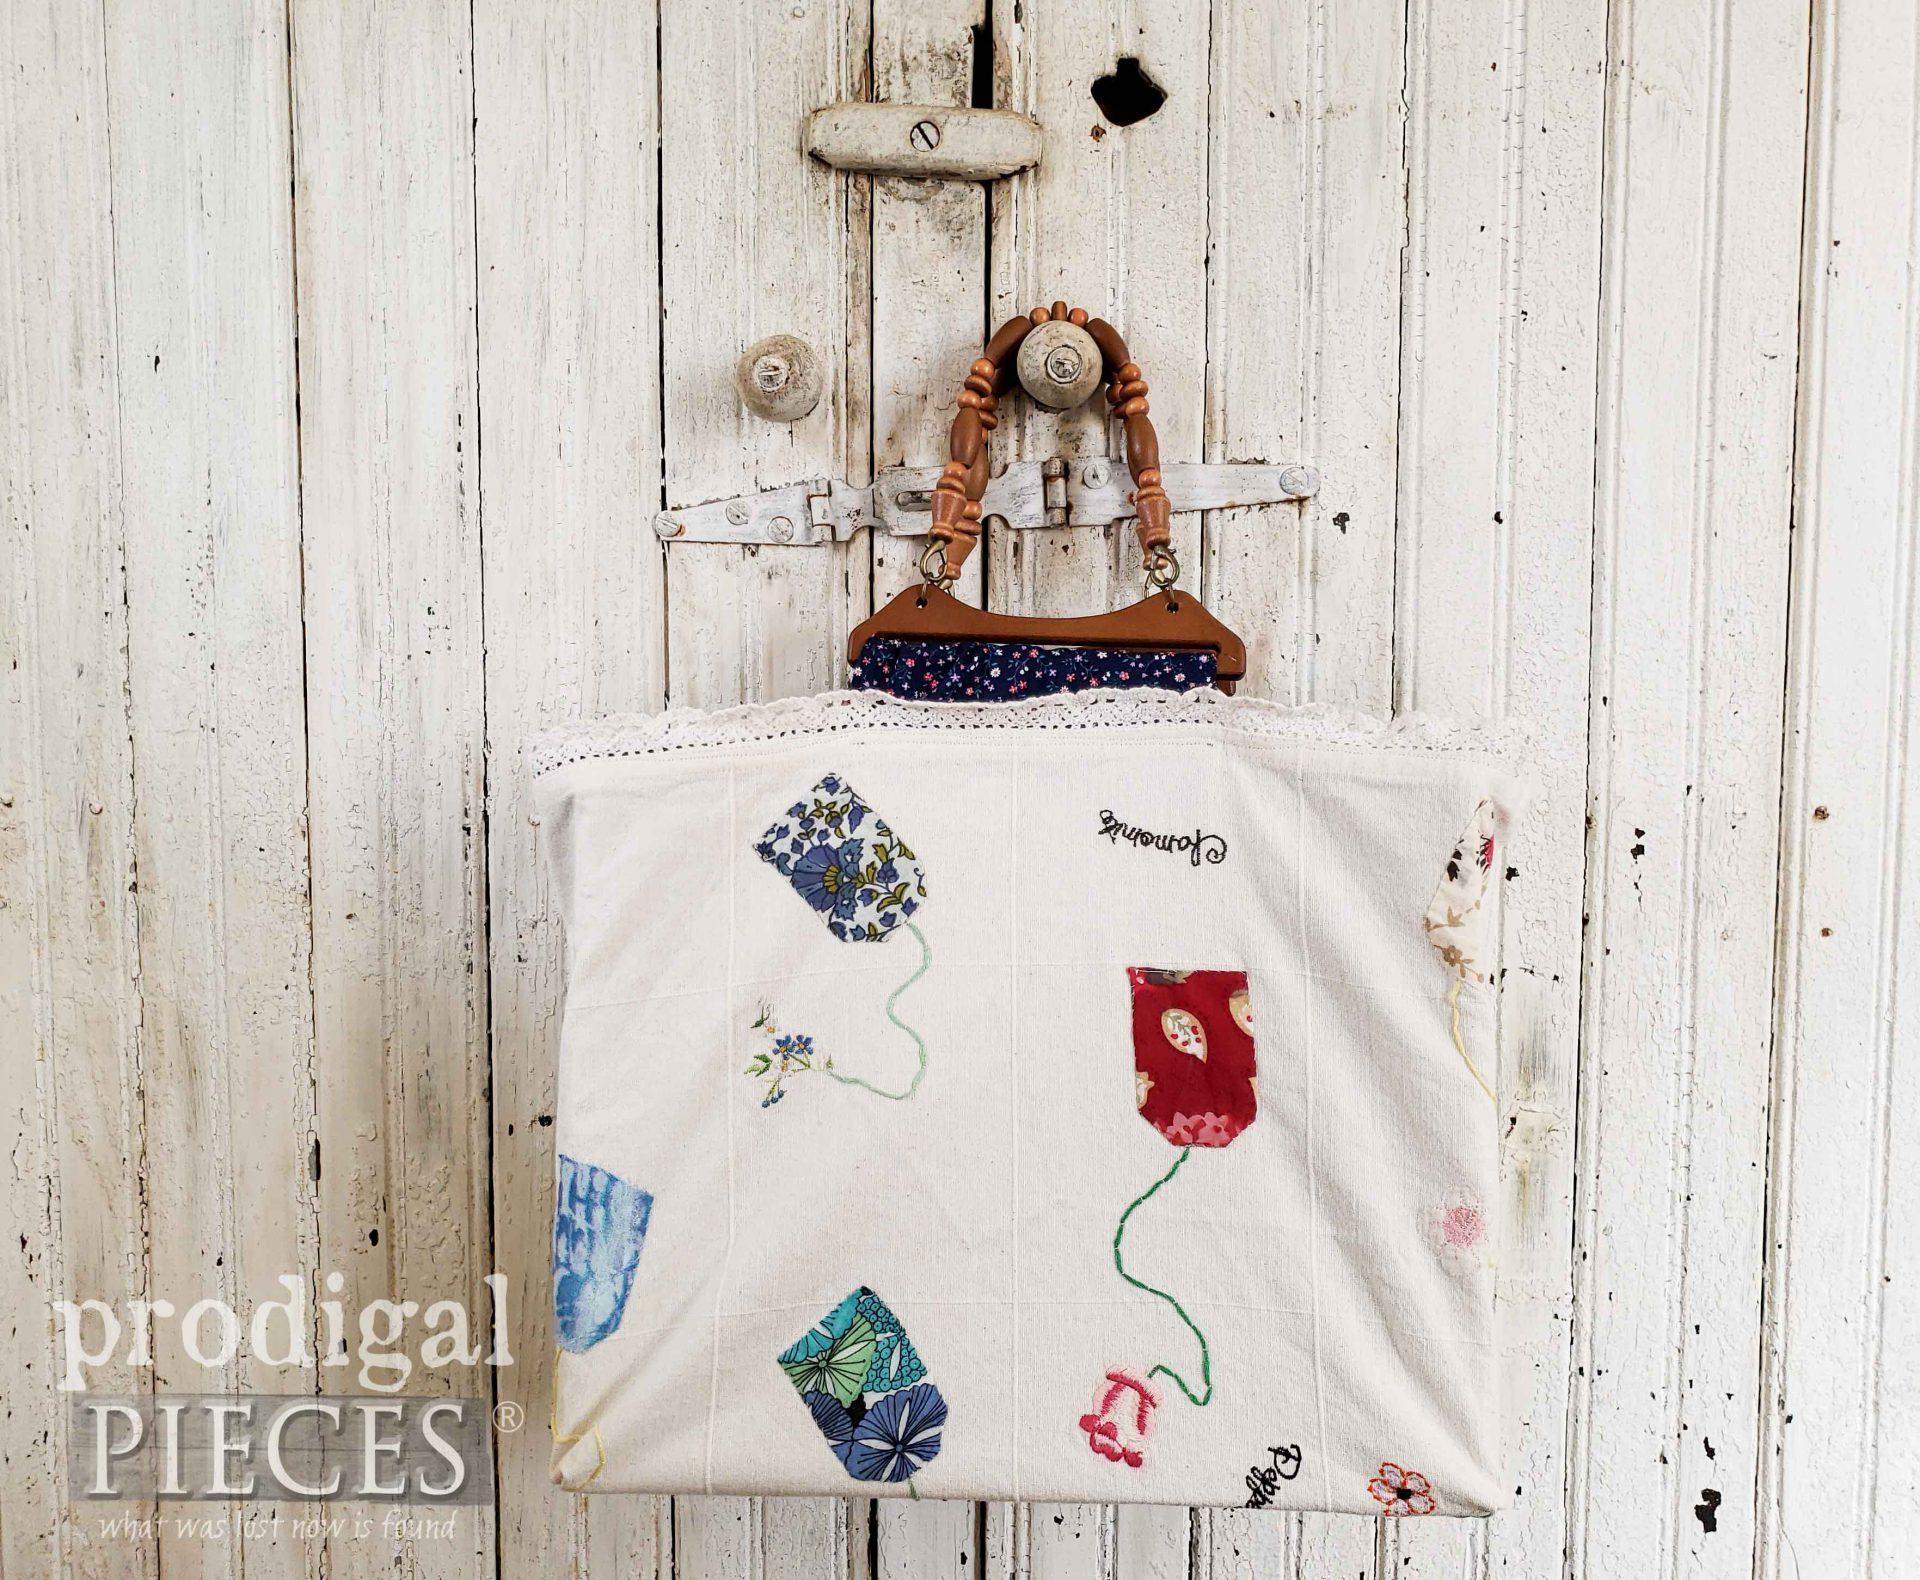 DIY Refashioned Tea Towel Bag made by Larissa of Prodigal Pieces | prodigalpieces.com #prodigalpieces #diy #sewing #refashion #style #women #bag